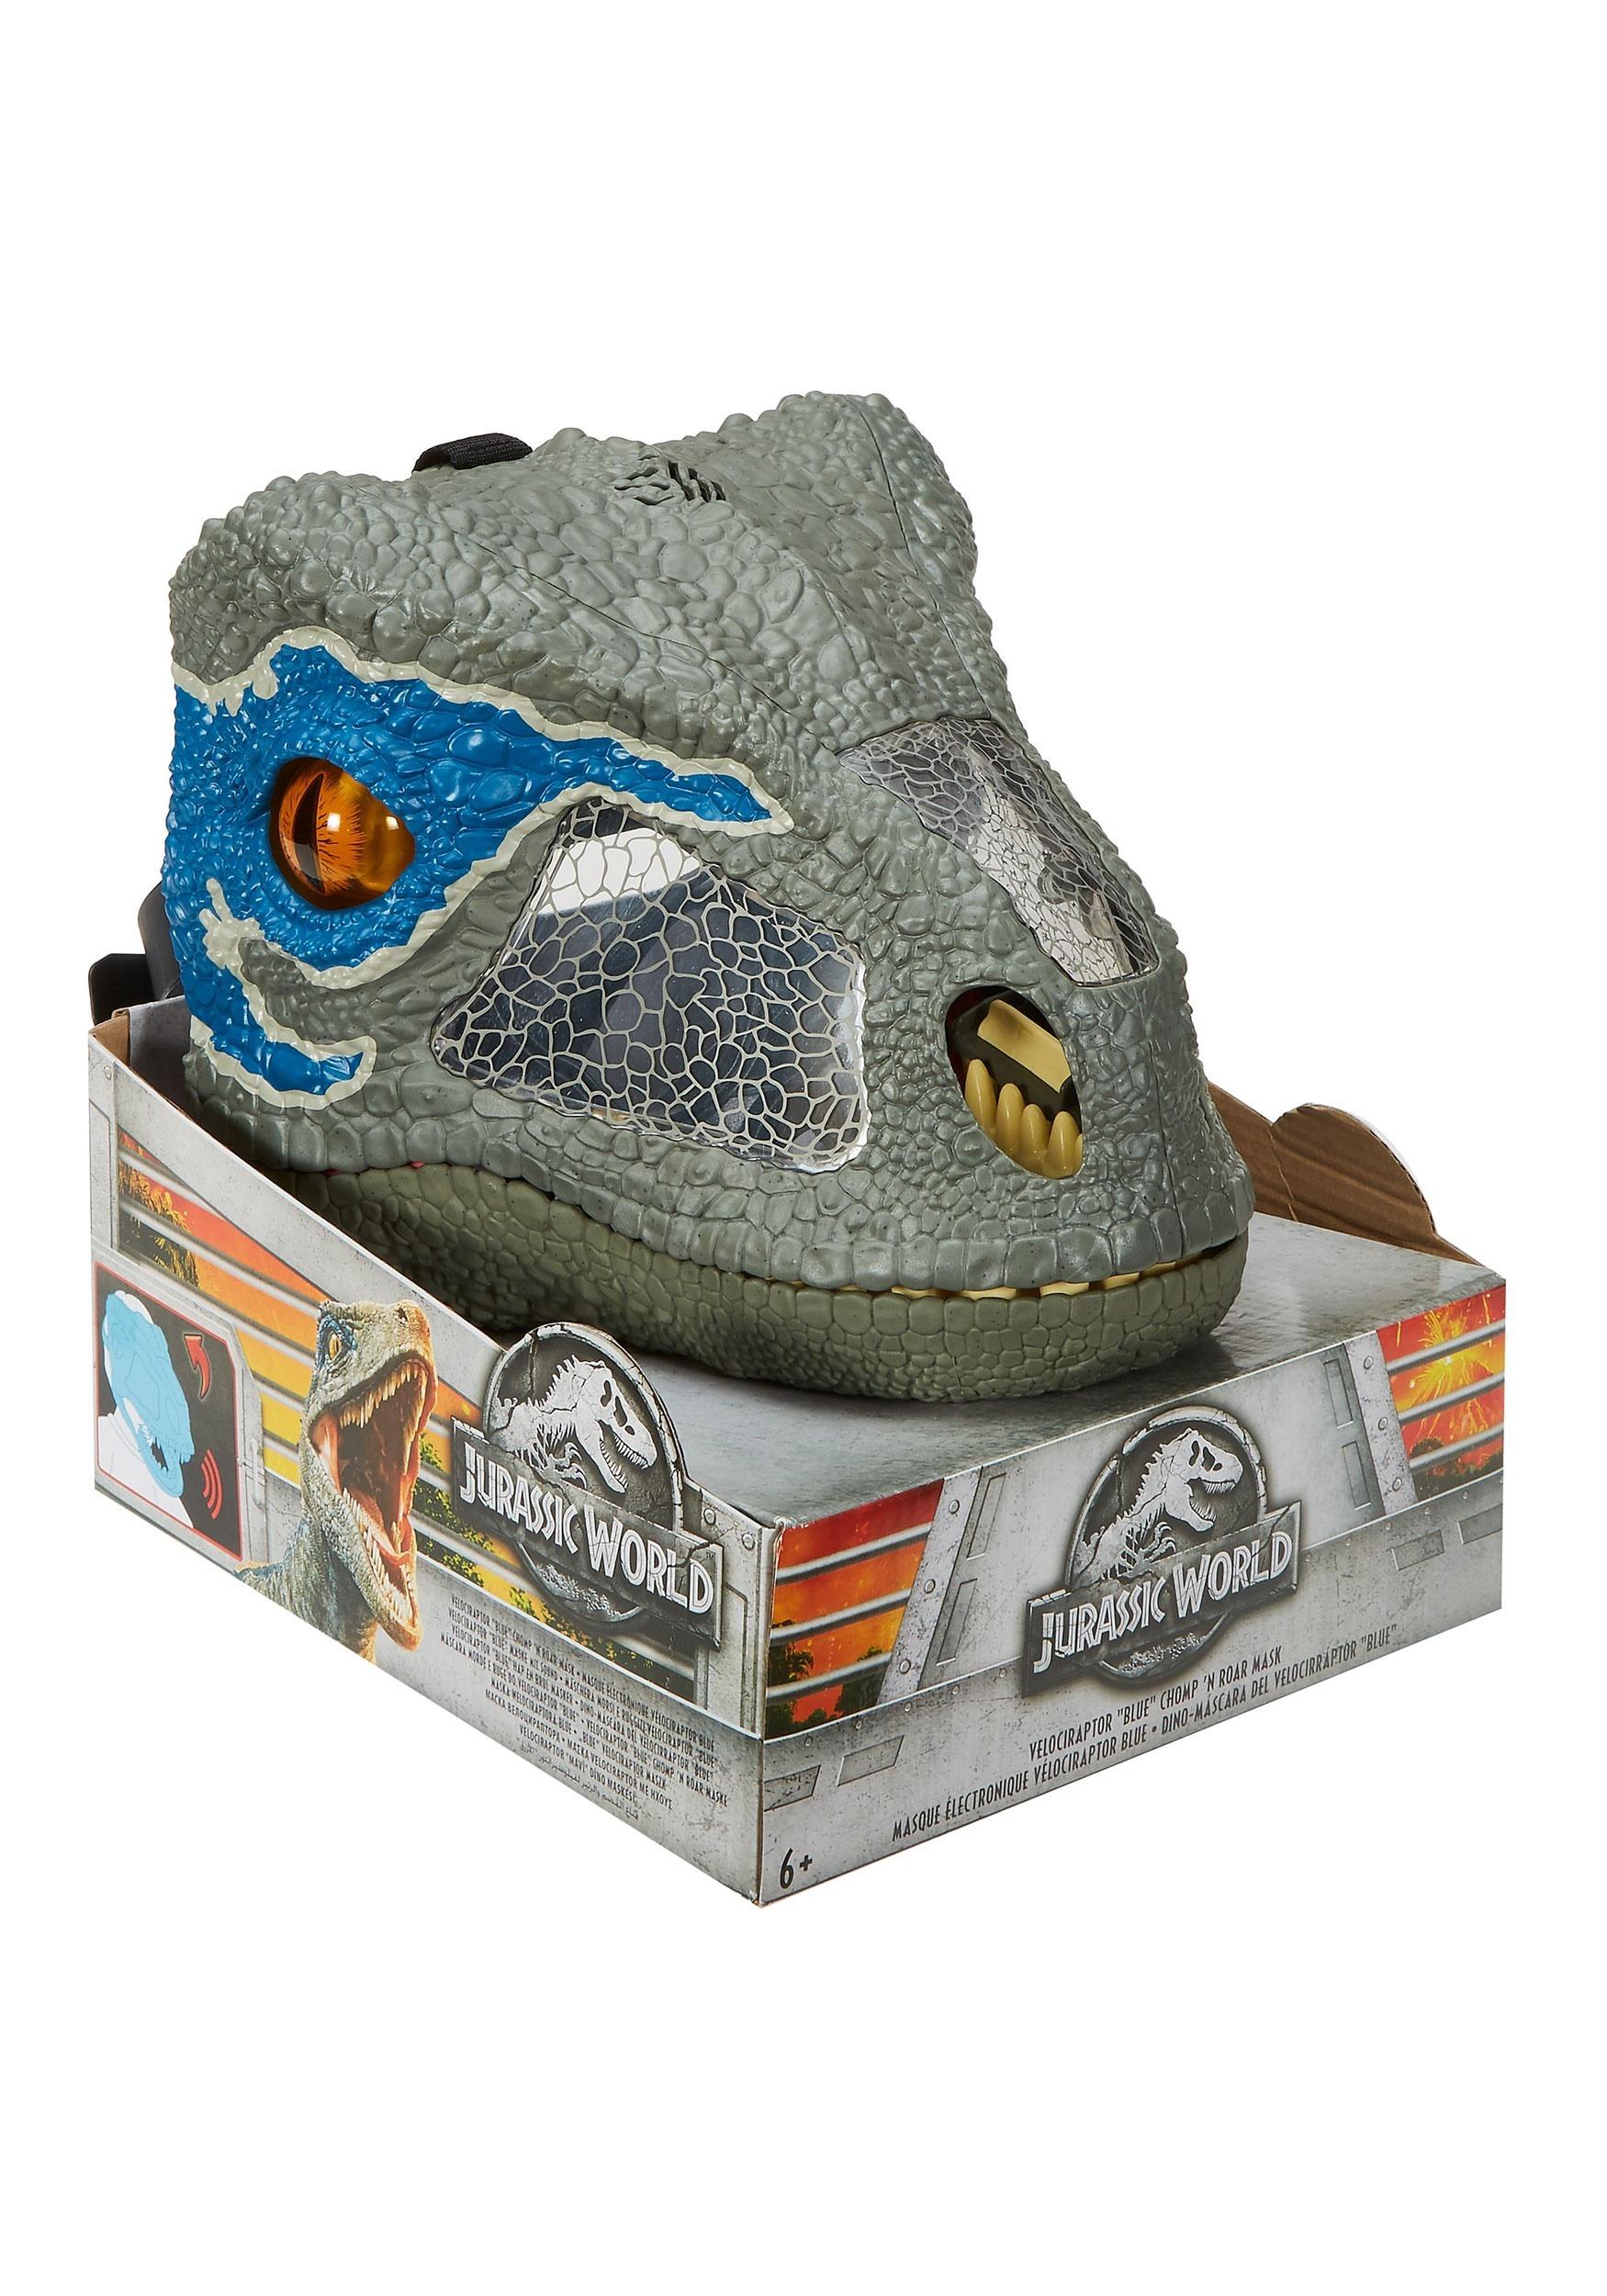 Dino Child Mask W Sounds Jurassic World